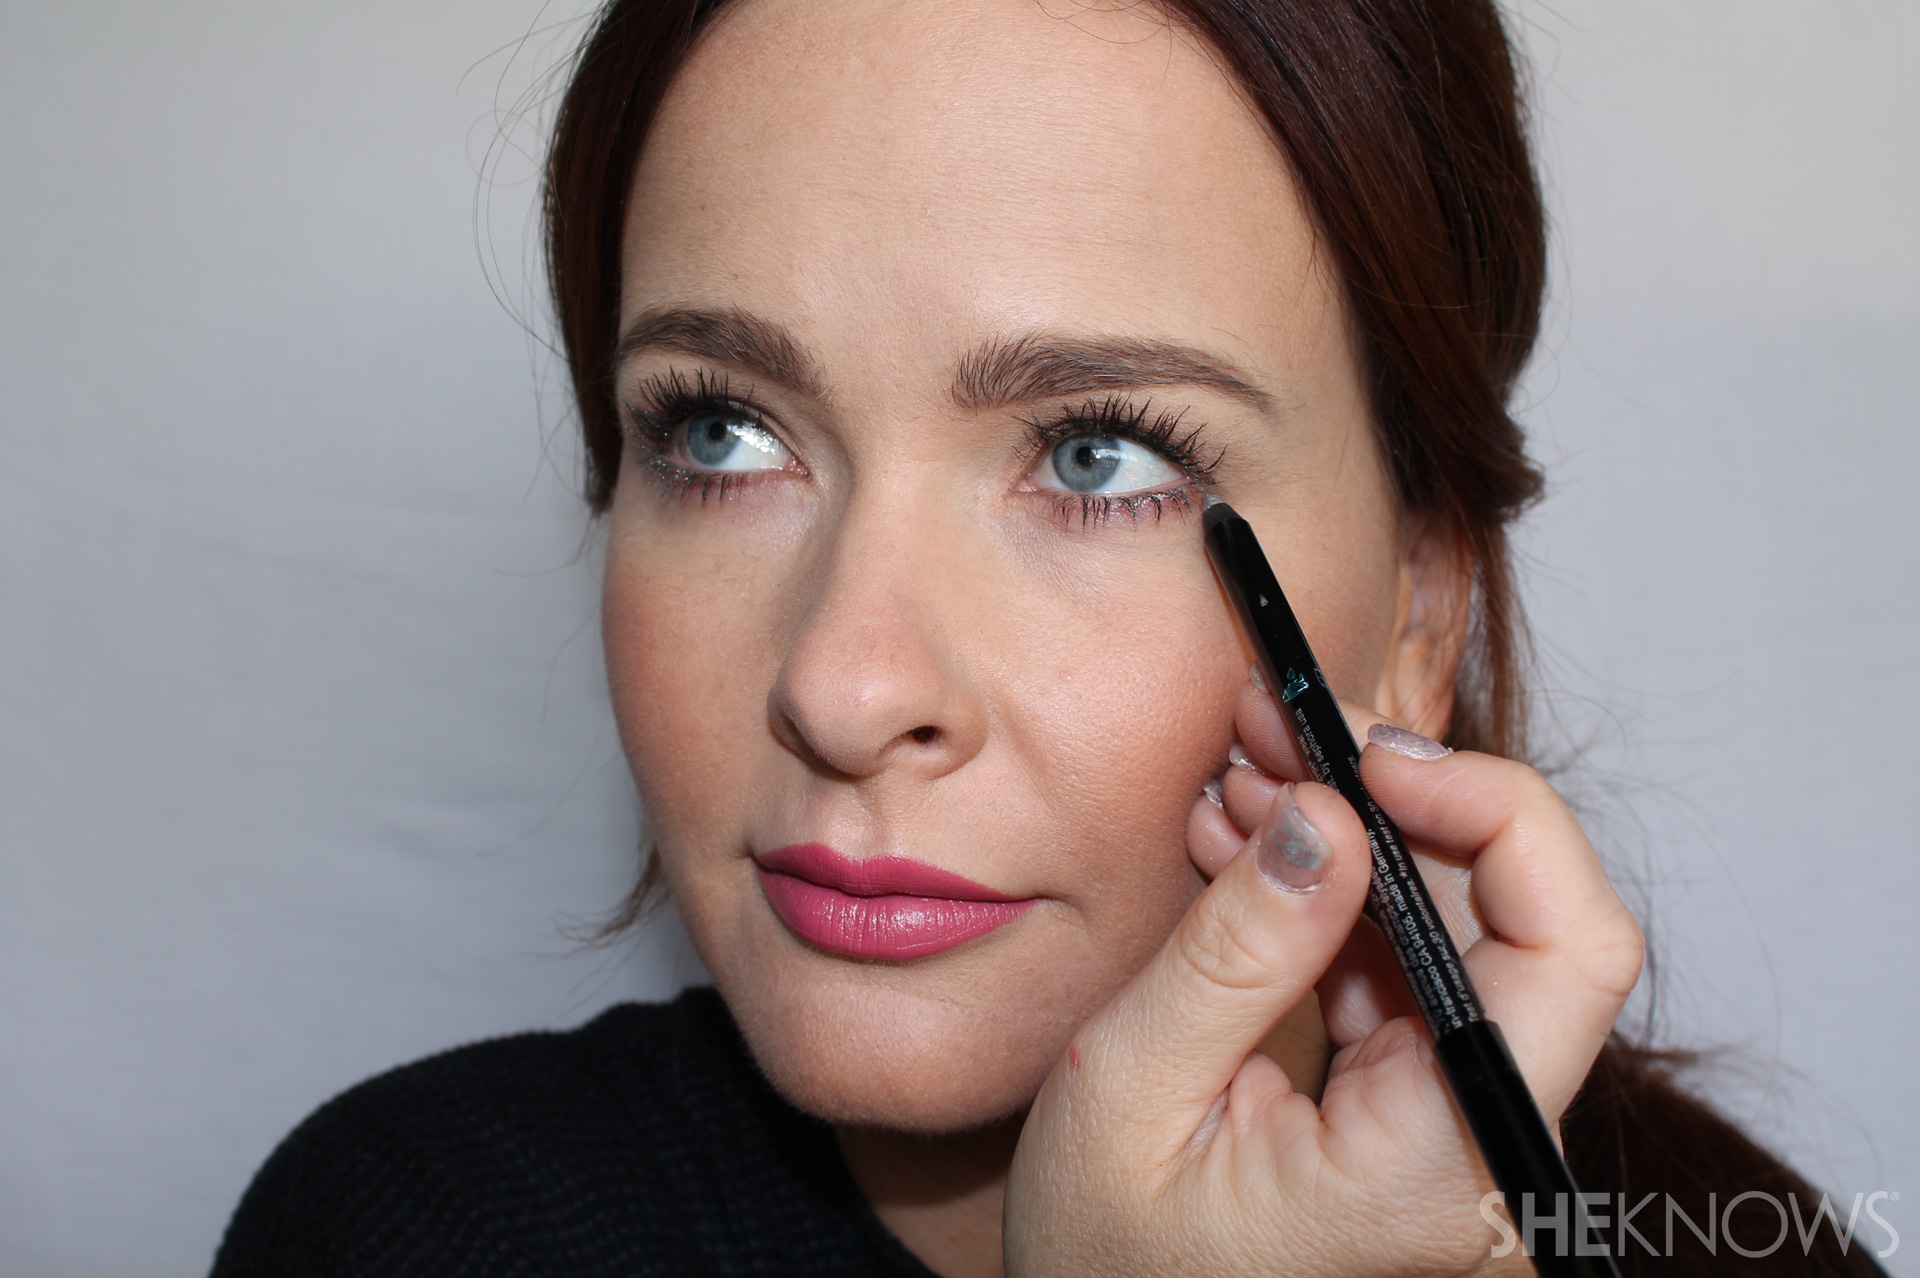 Undereye Step 1: Draw straight line across your lower lash